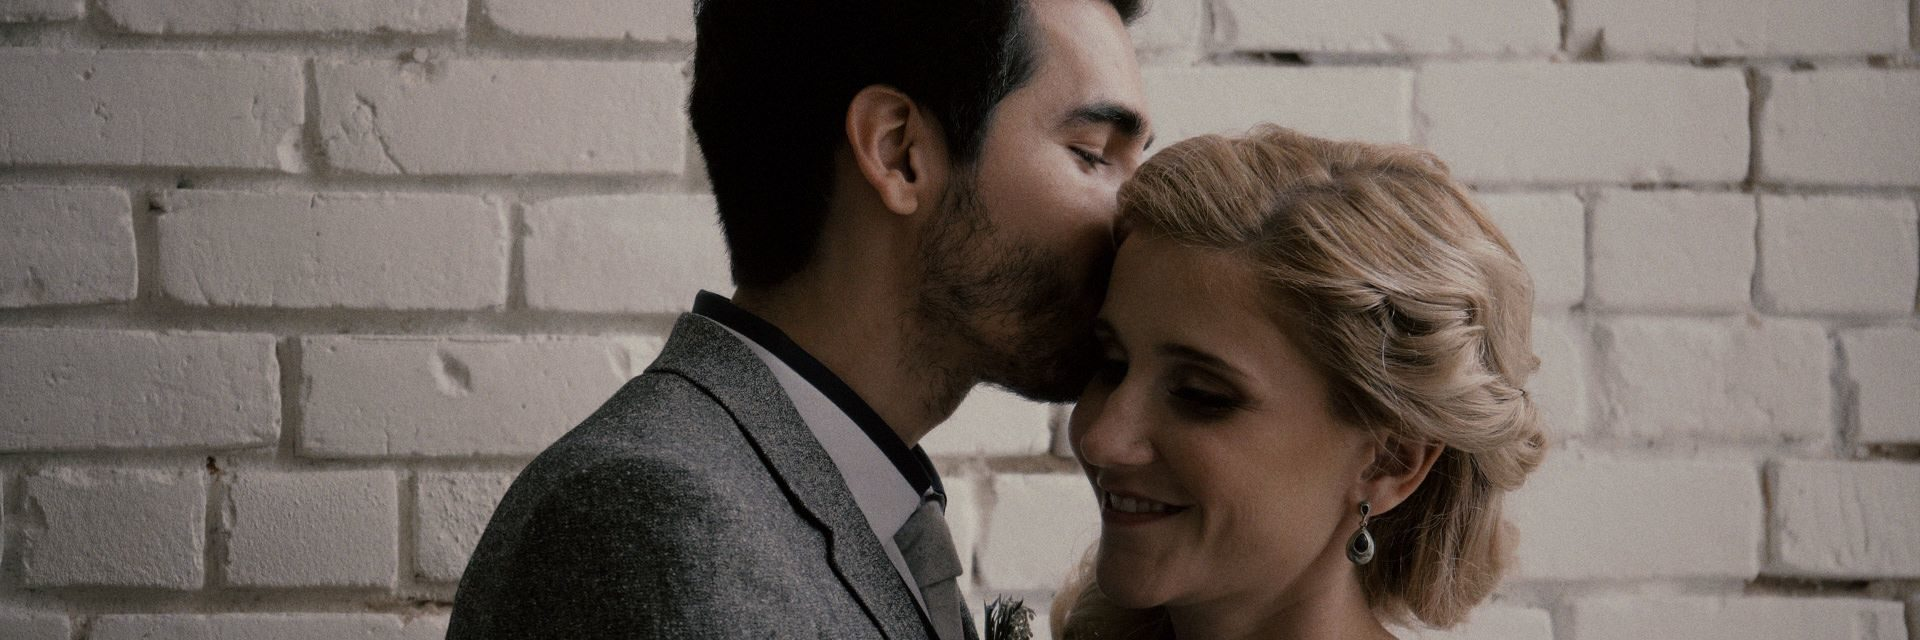 Brac-wedding-videographer-cinemate-films-03